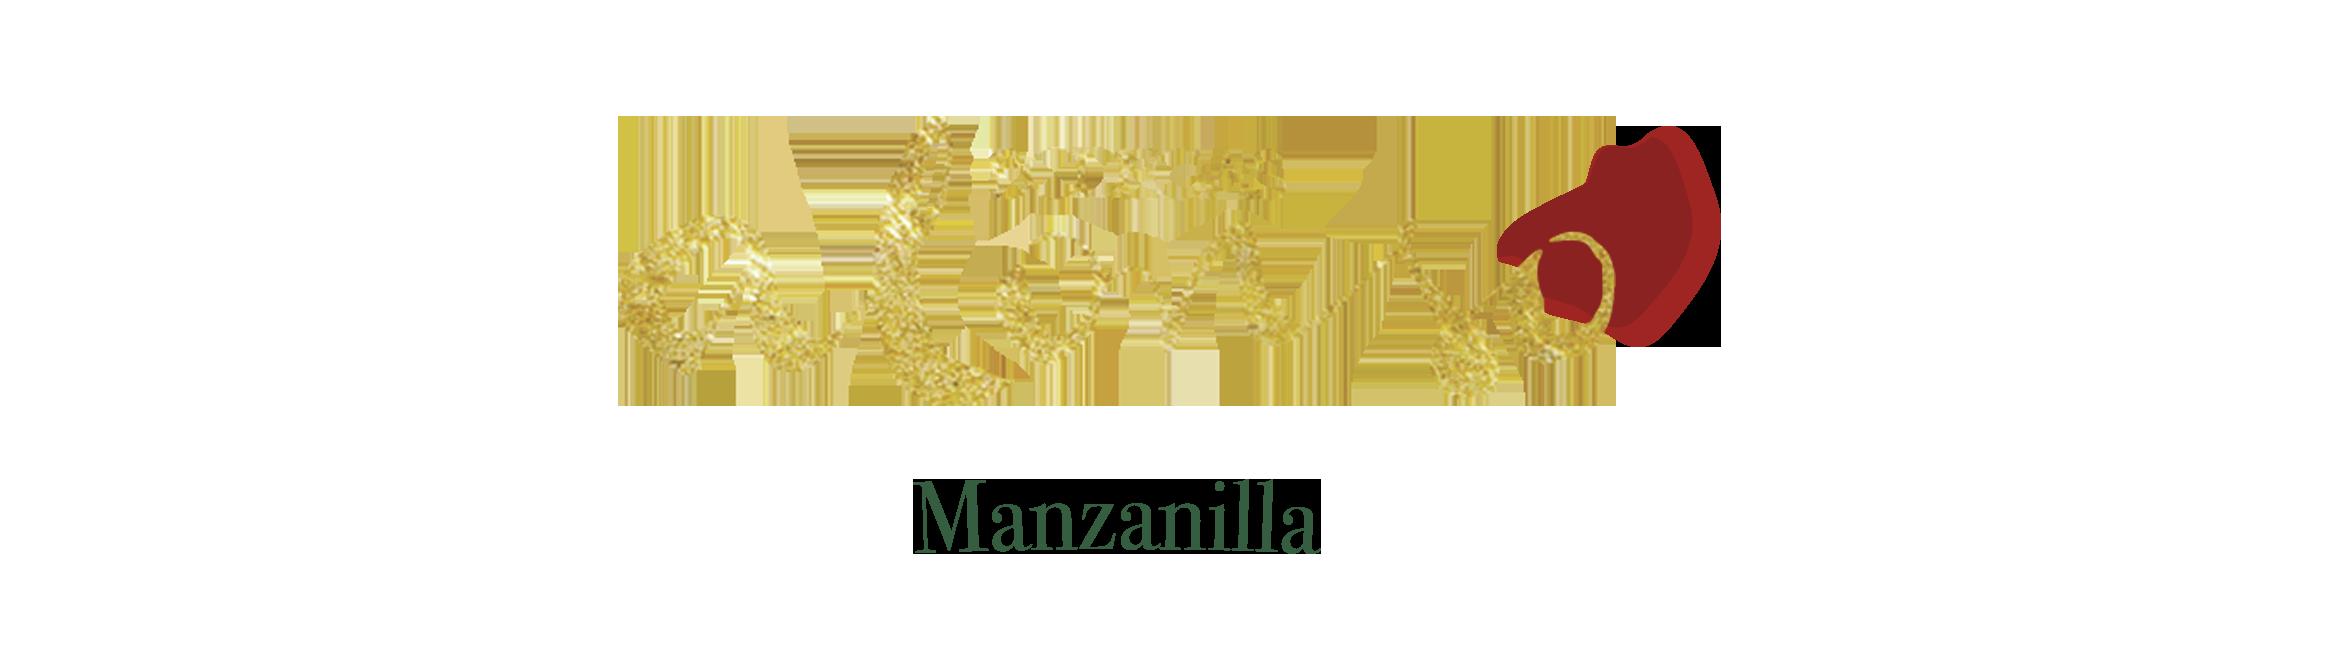 bodegas-alonso-vinos-manzanilla